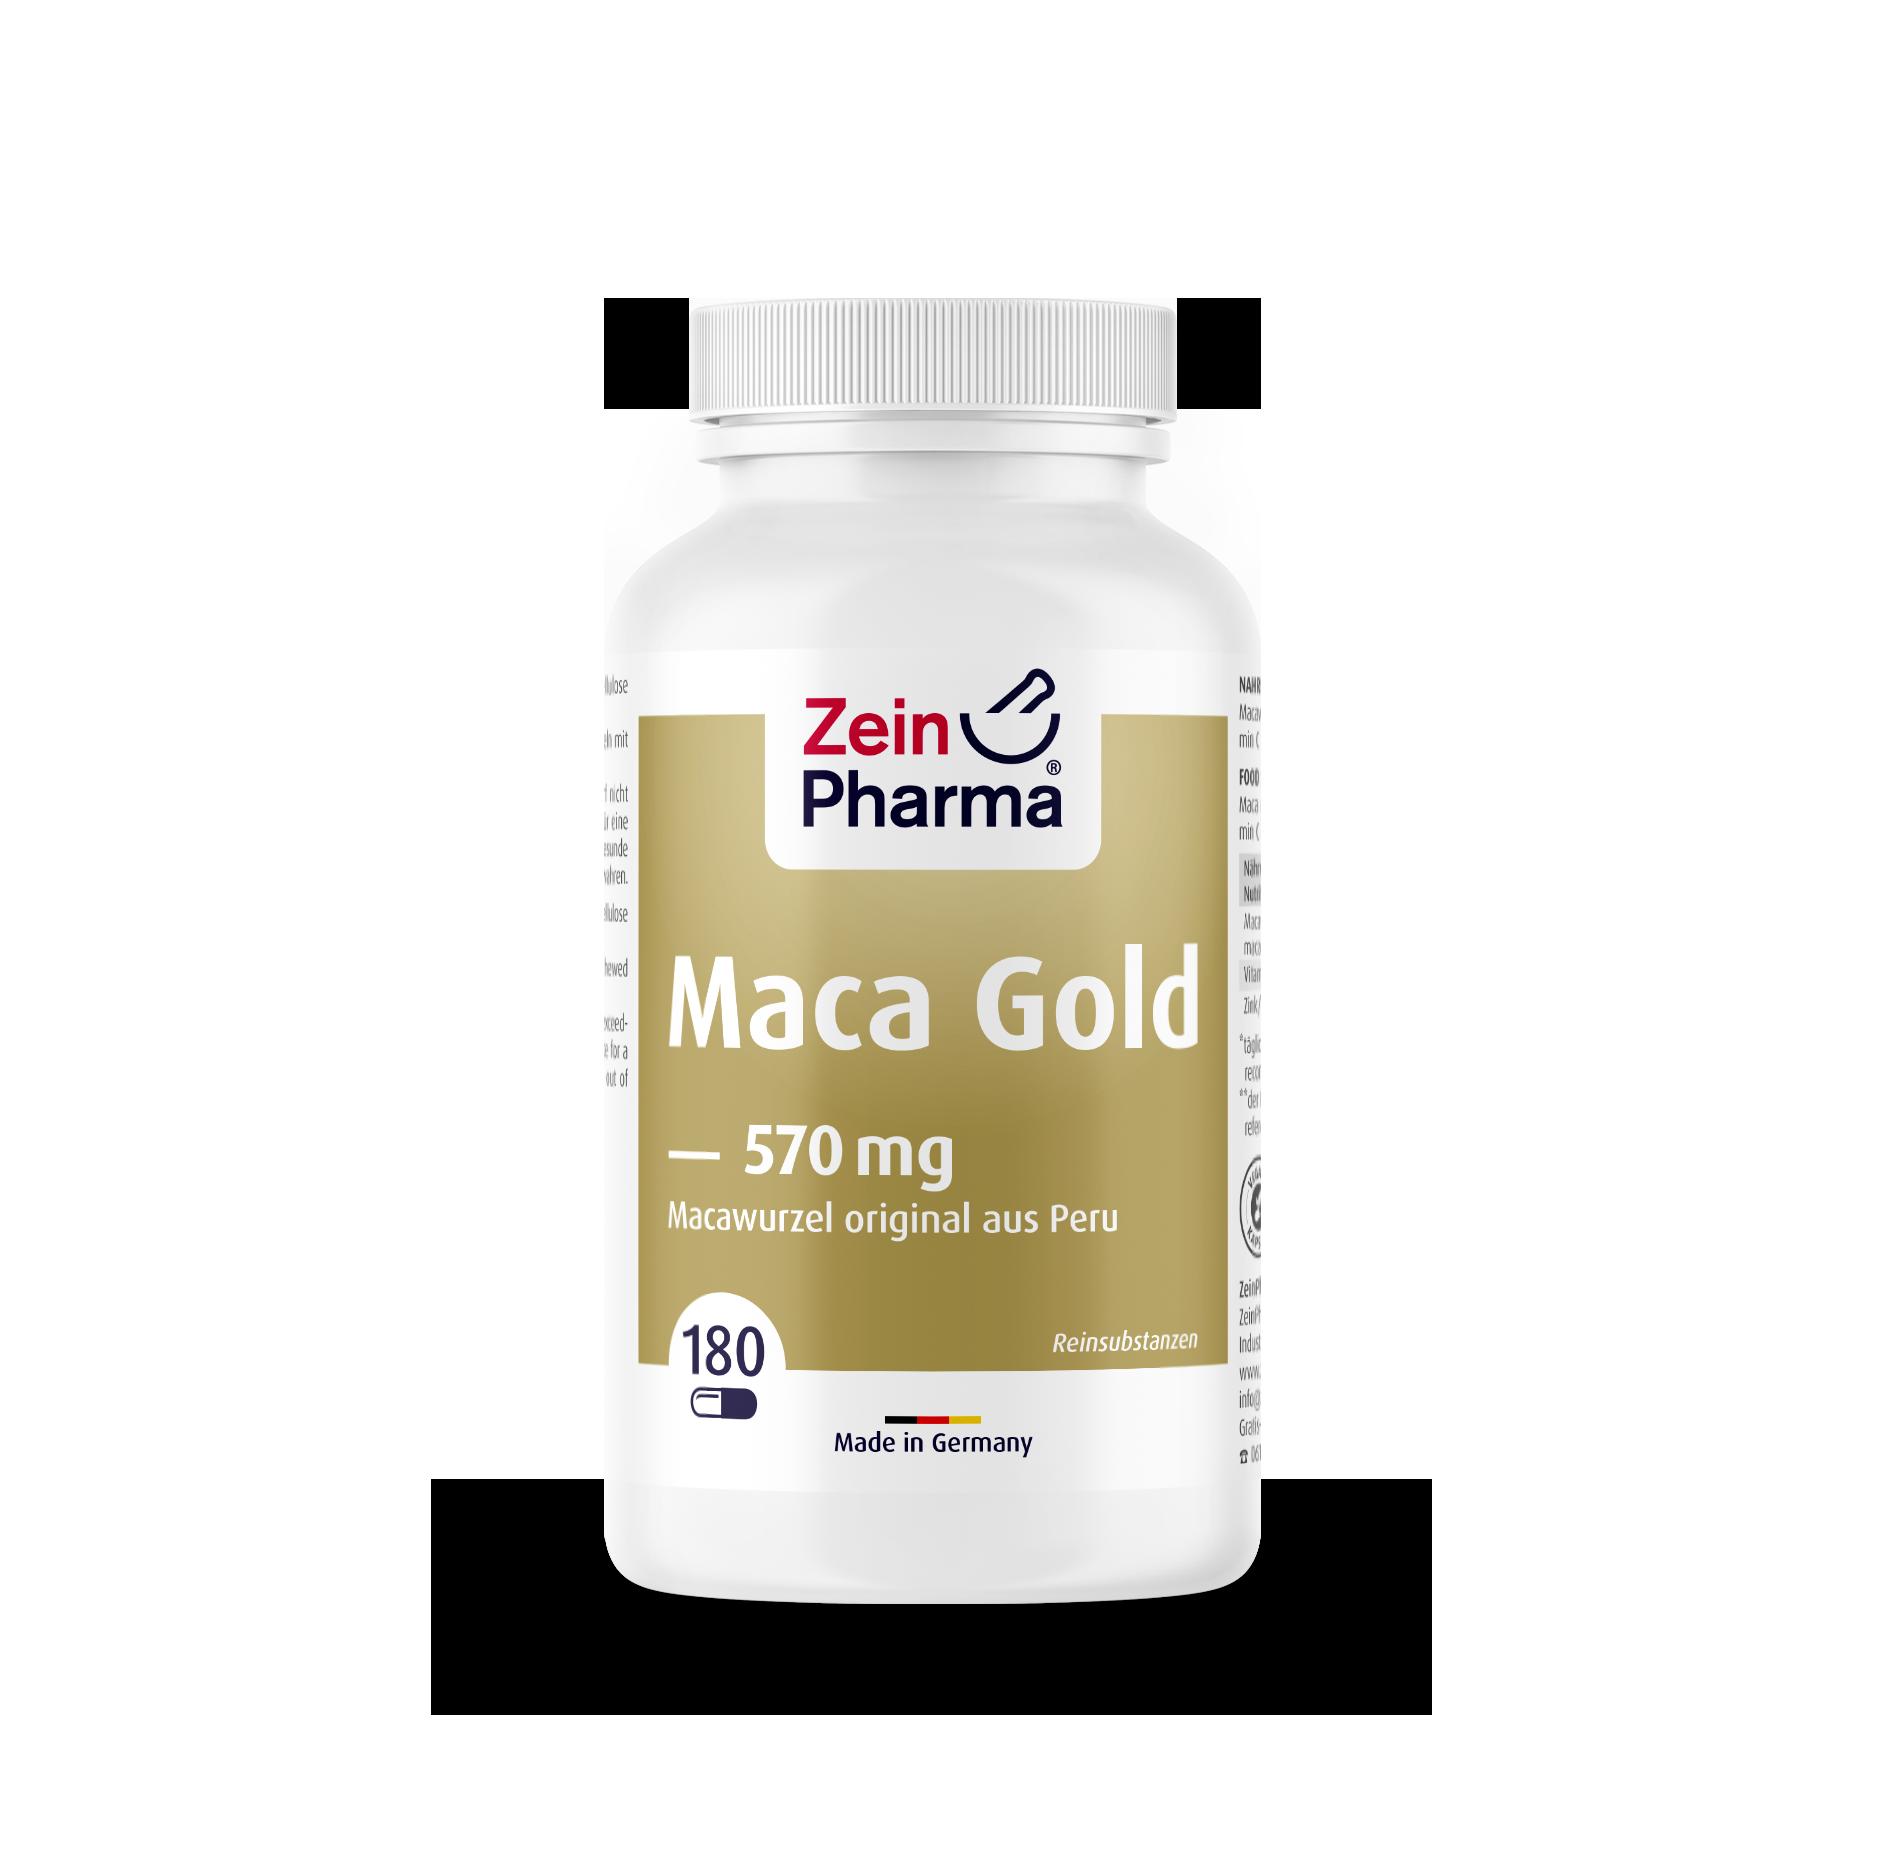 Maca Gold 570 mg